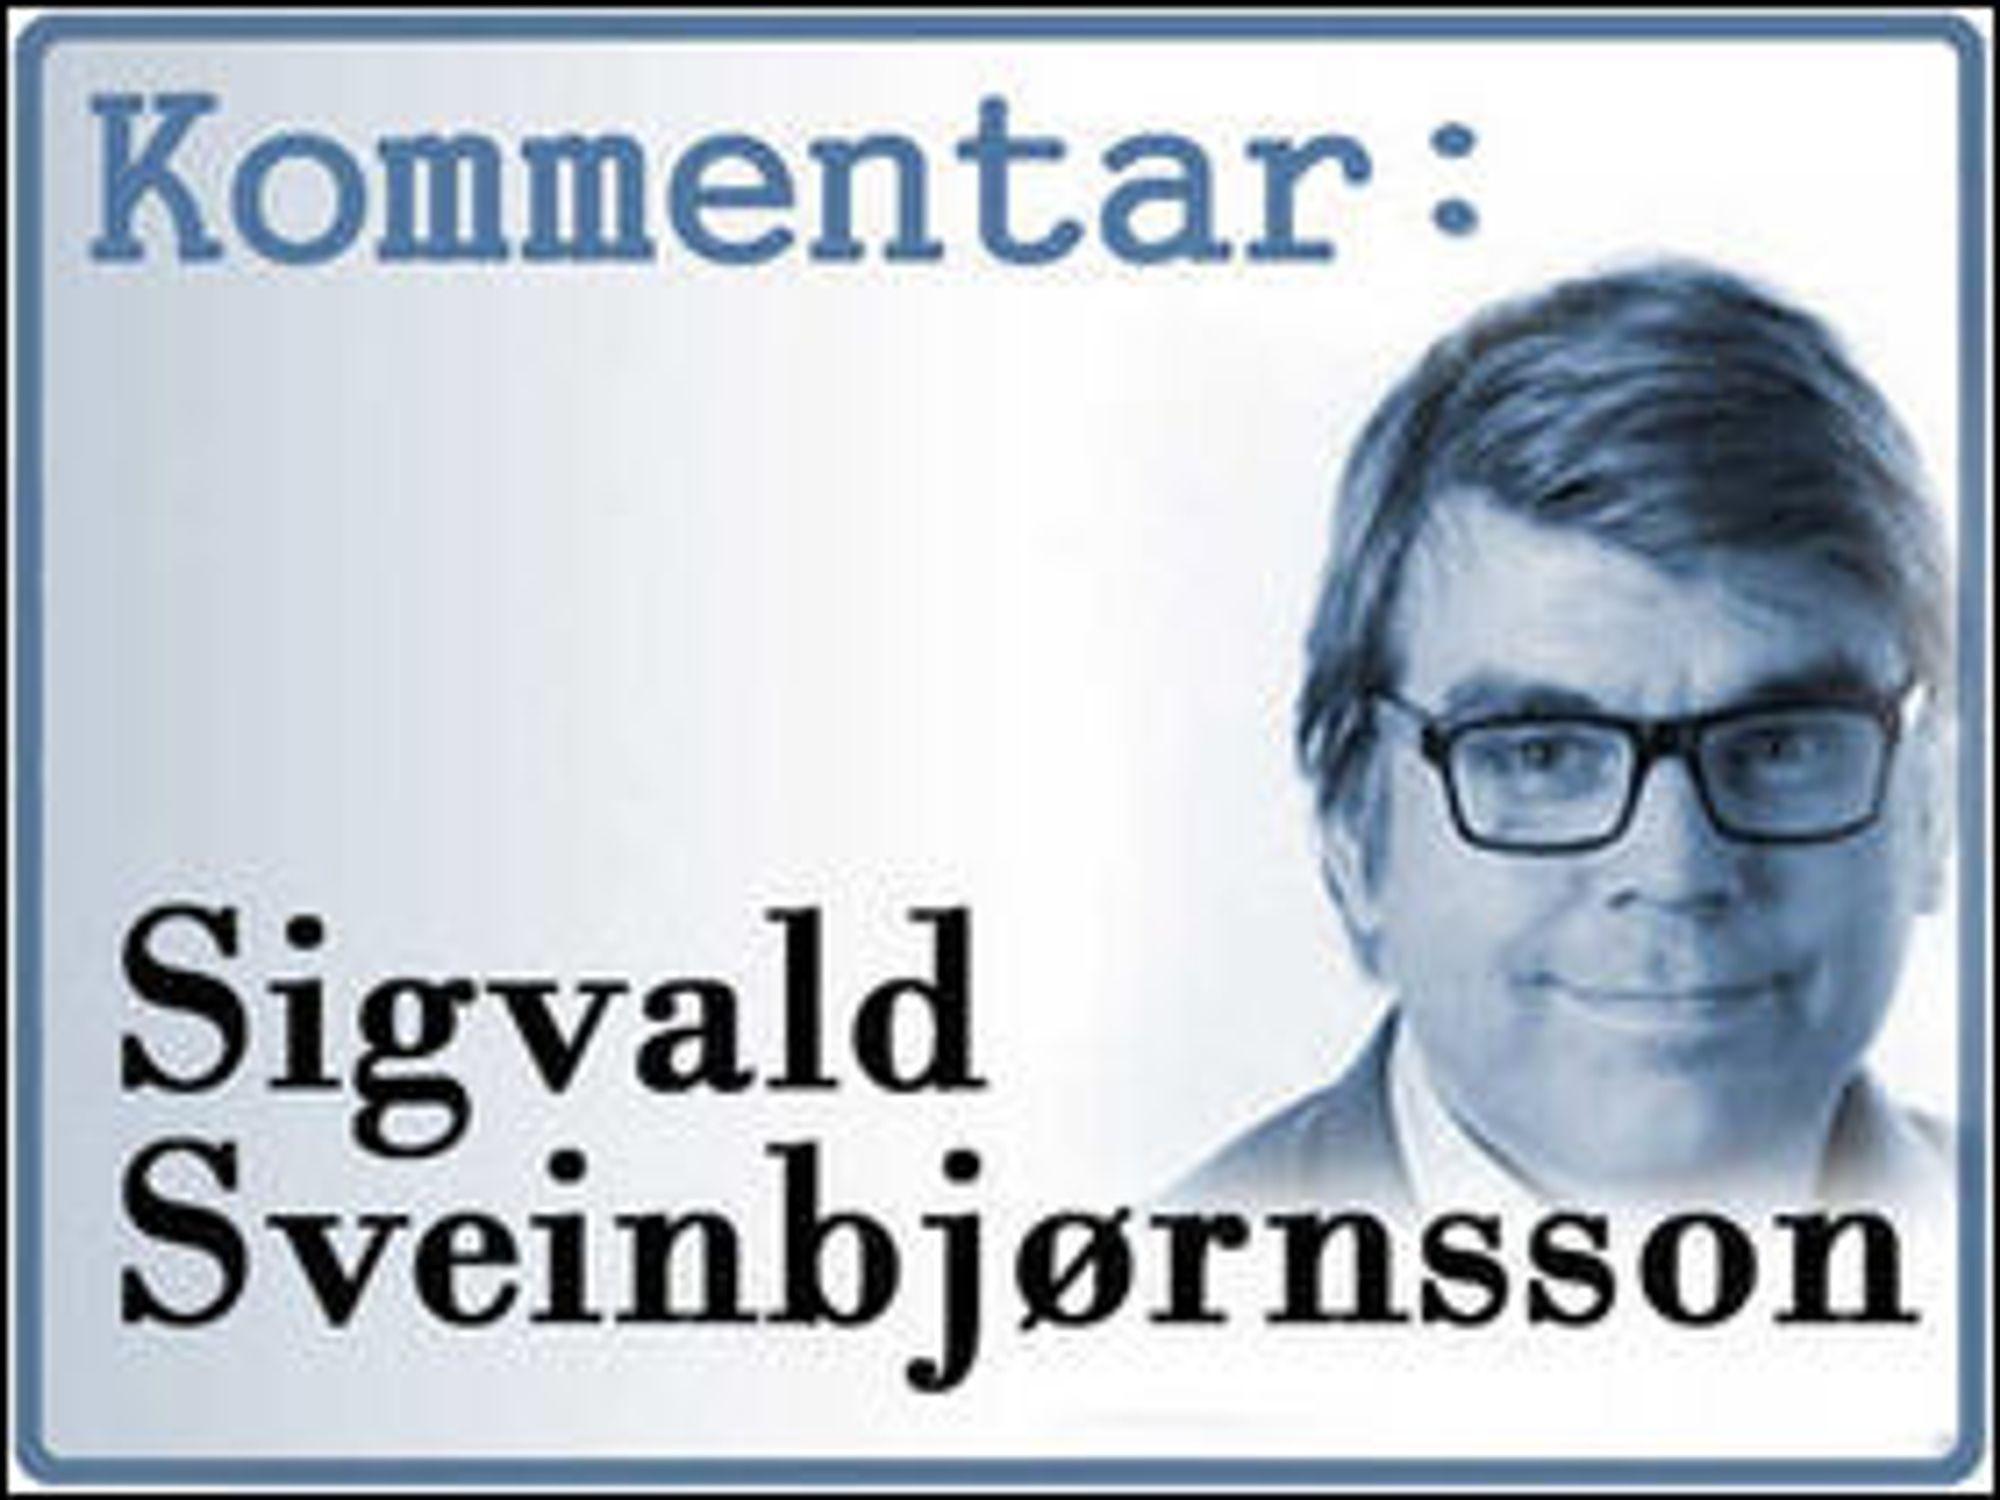 Sigvald Sveinbjørnsson er redaktør i digi.no